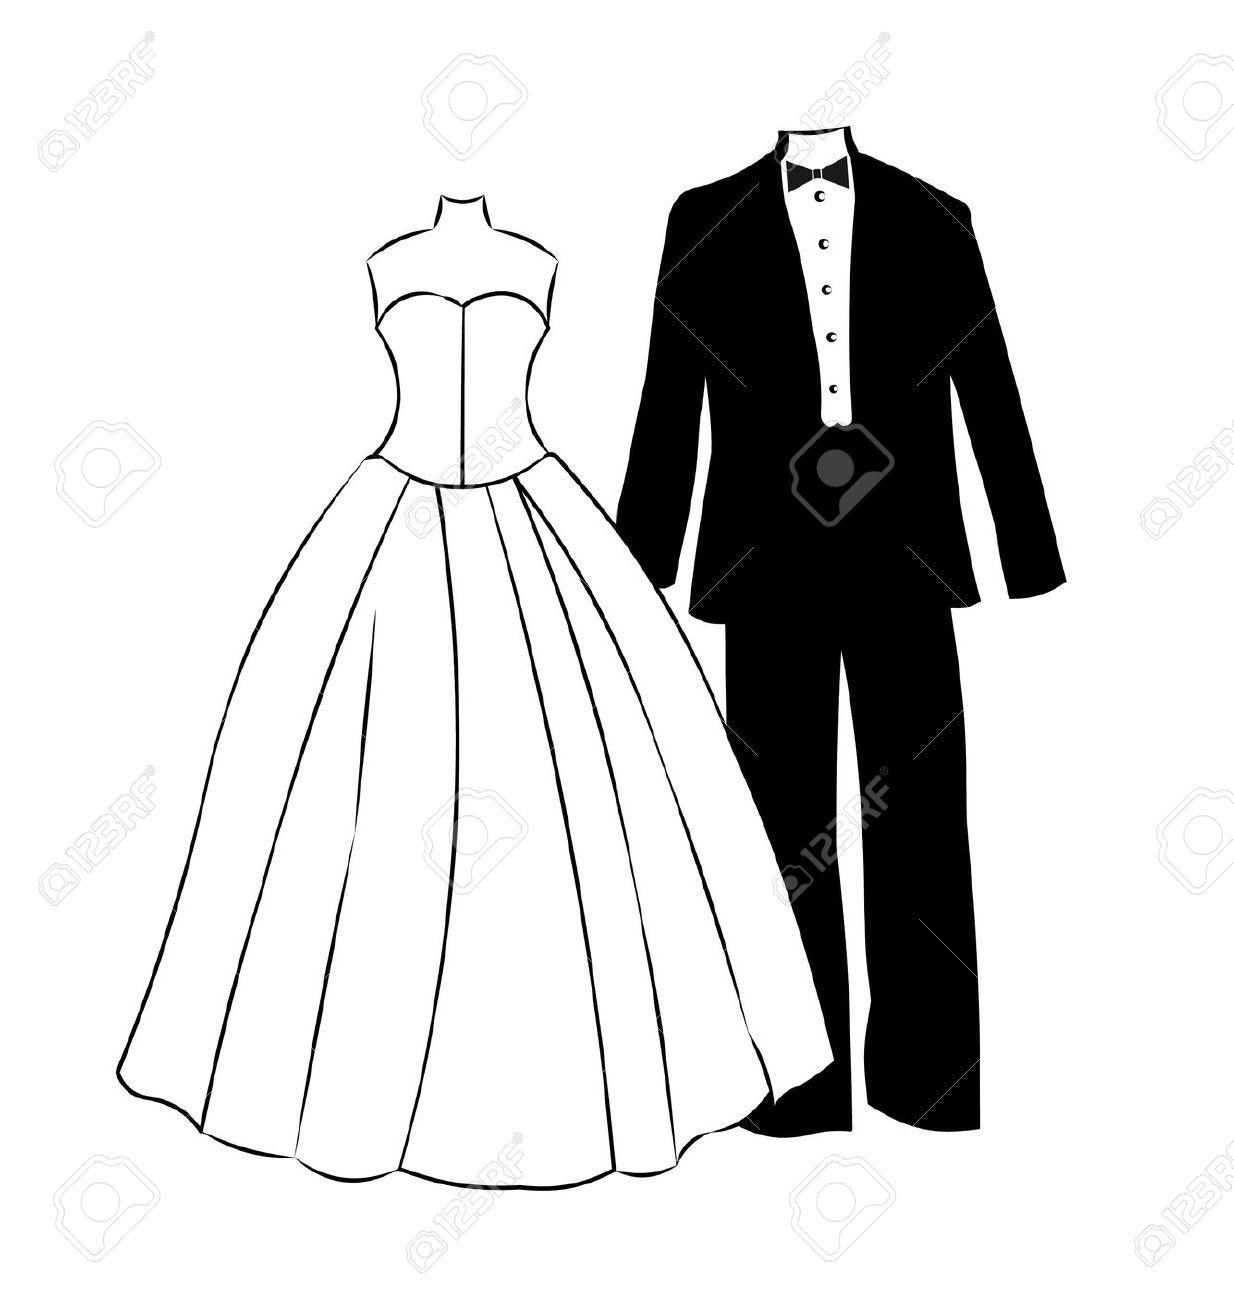 50+ Wedding Dress Clipart - Best Shapewear for Wedding Dress Check ...